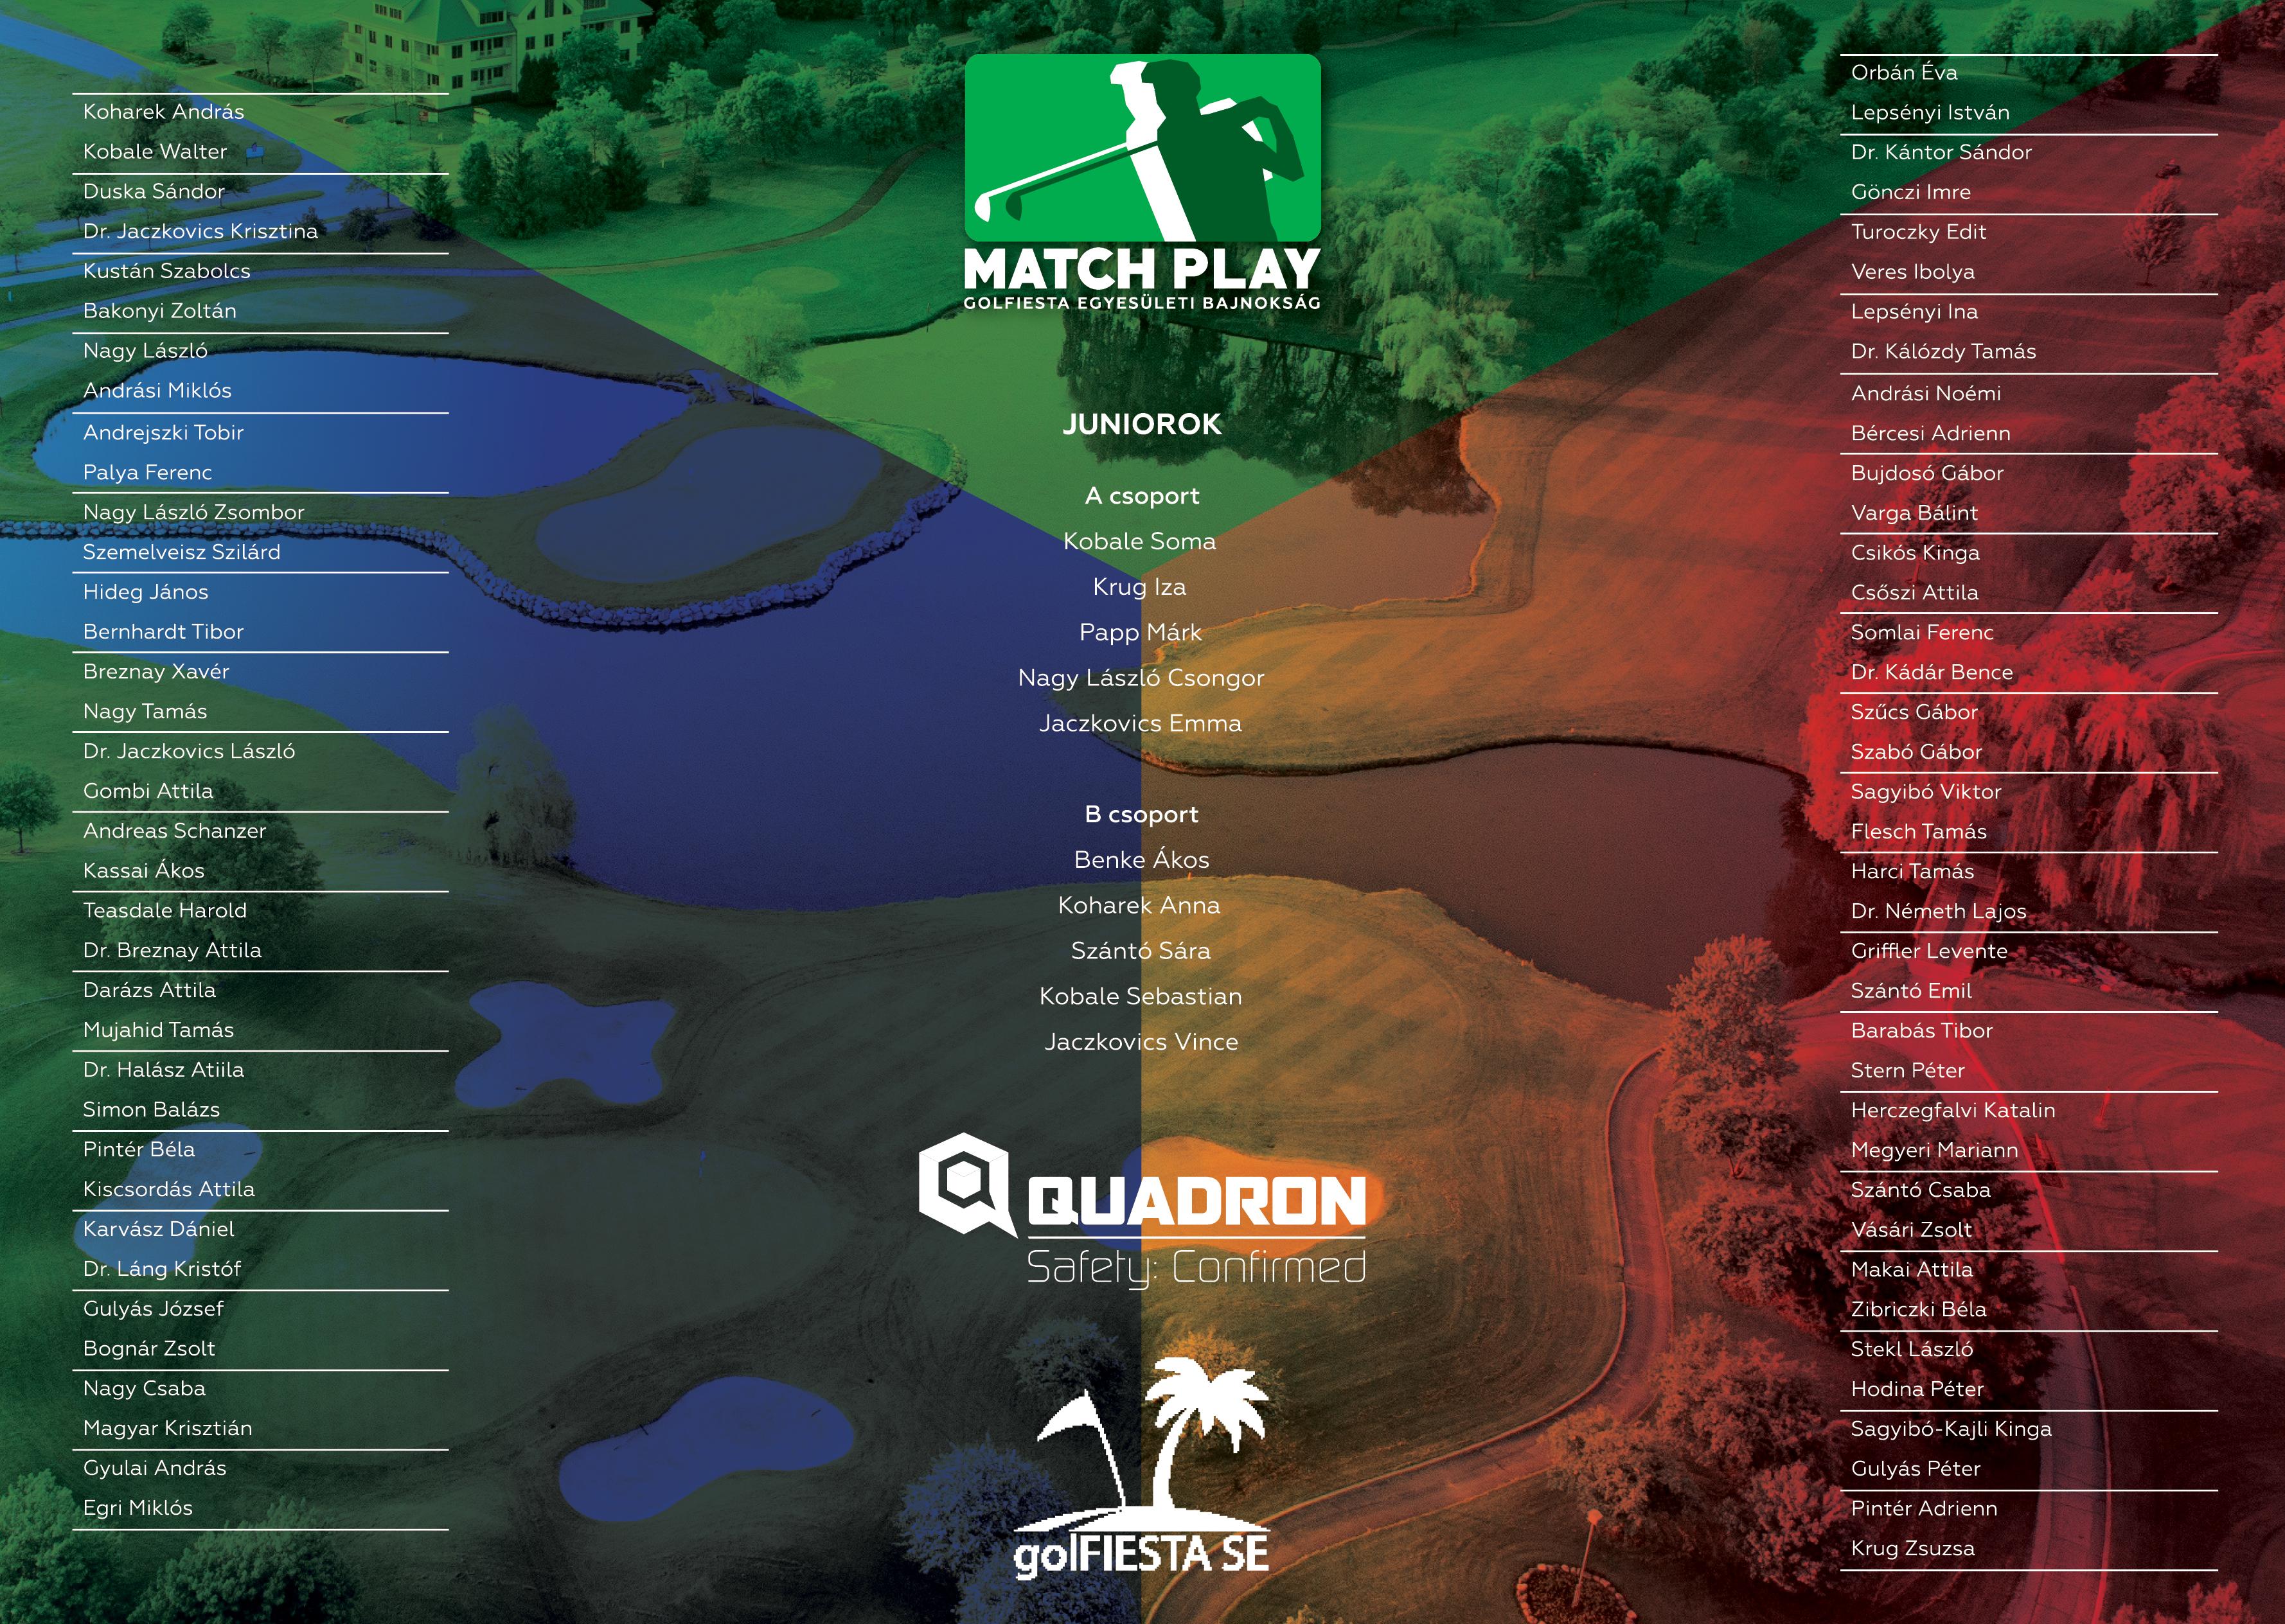 GOLFIESTA-QUADRON Match Play Bajnokság 2016